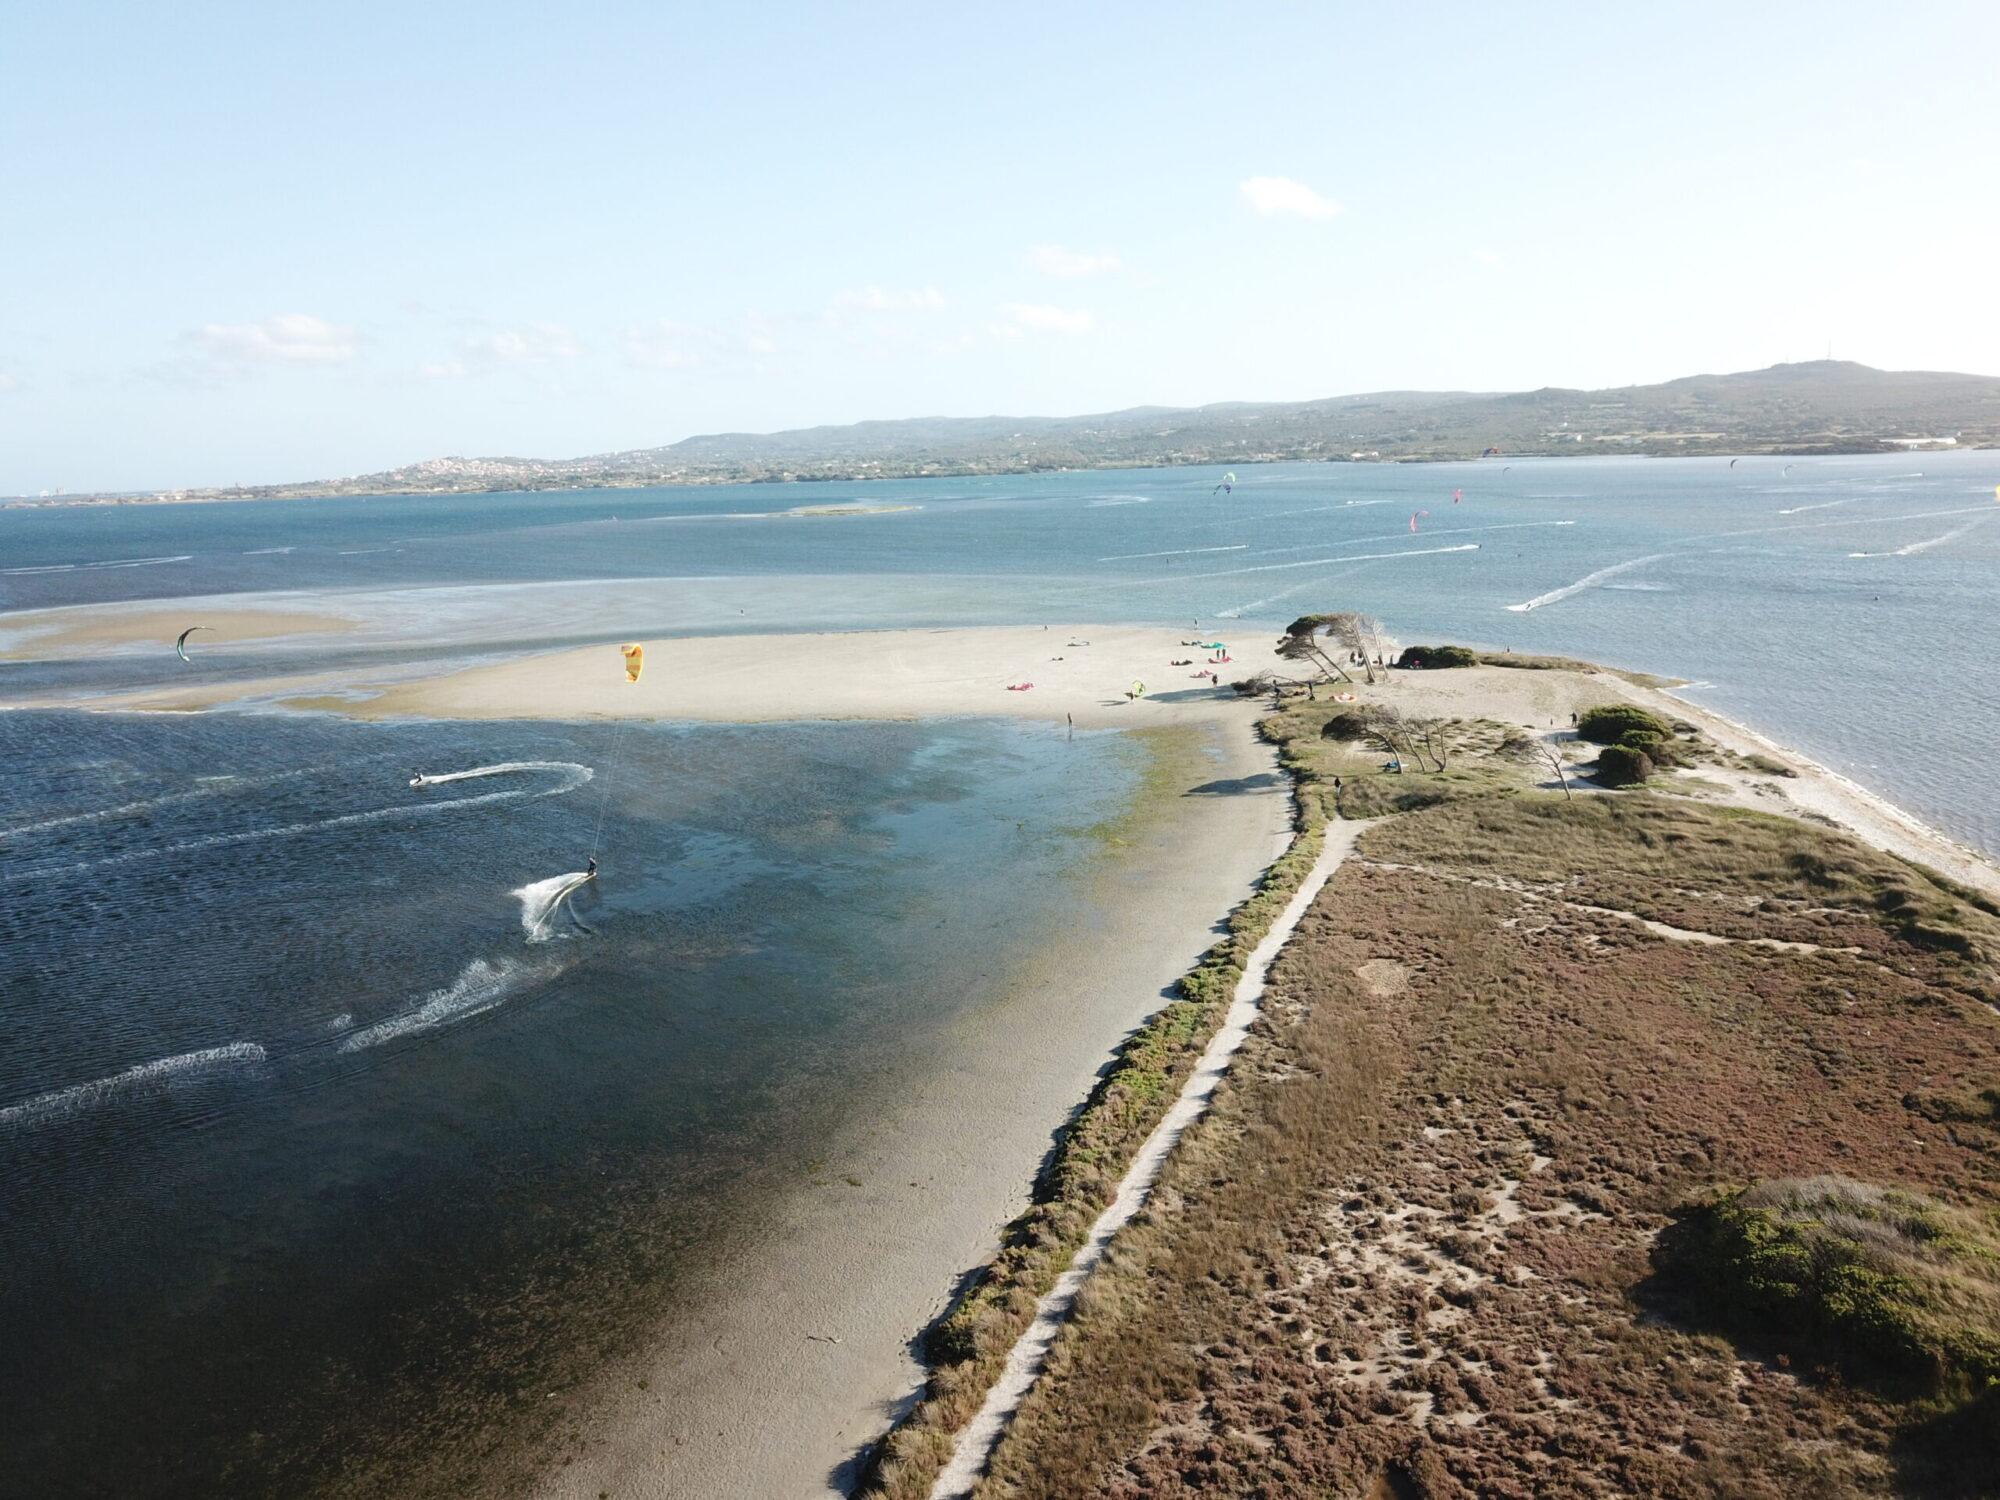 Punta Trettu, The best Kite Spot of Sardinia